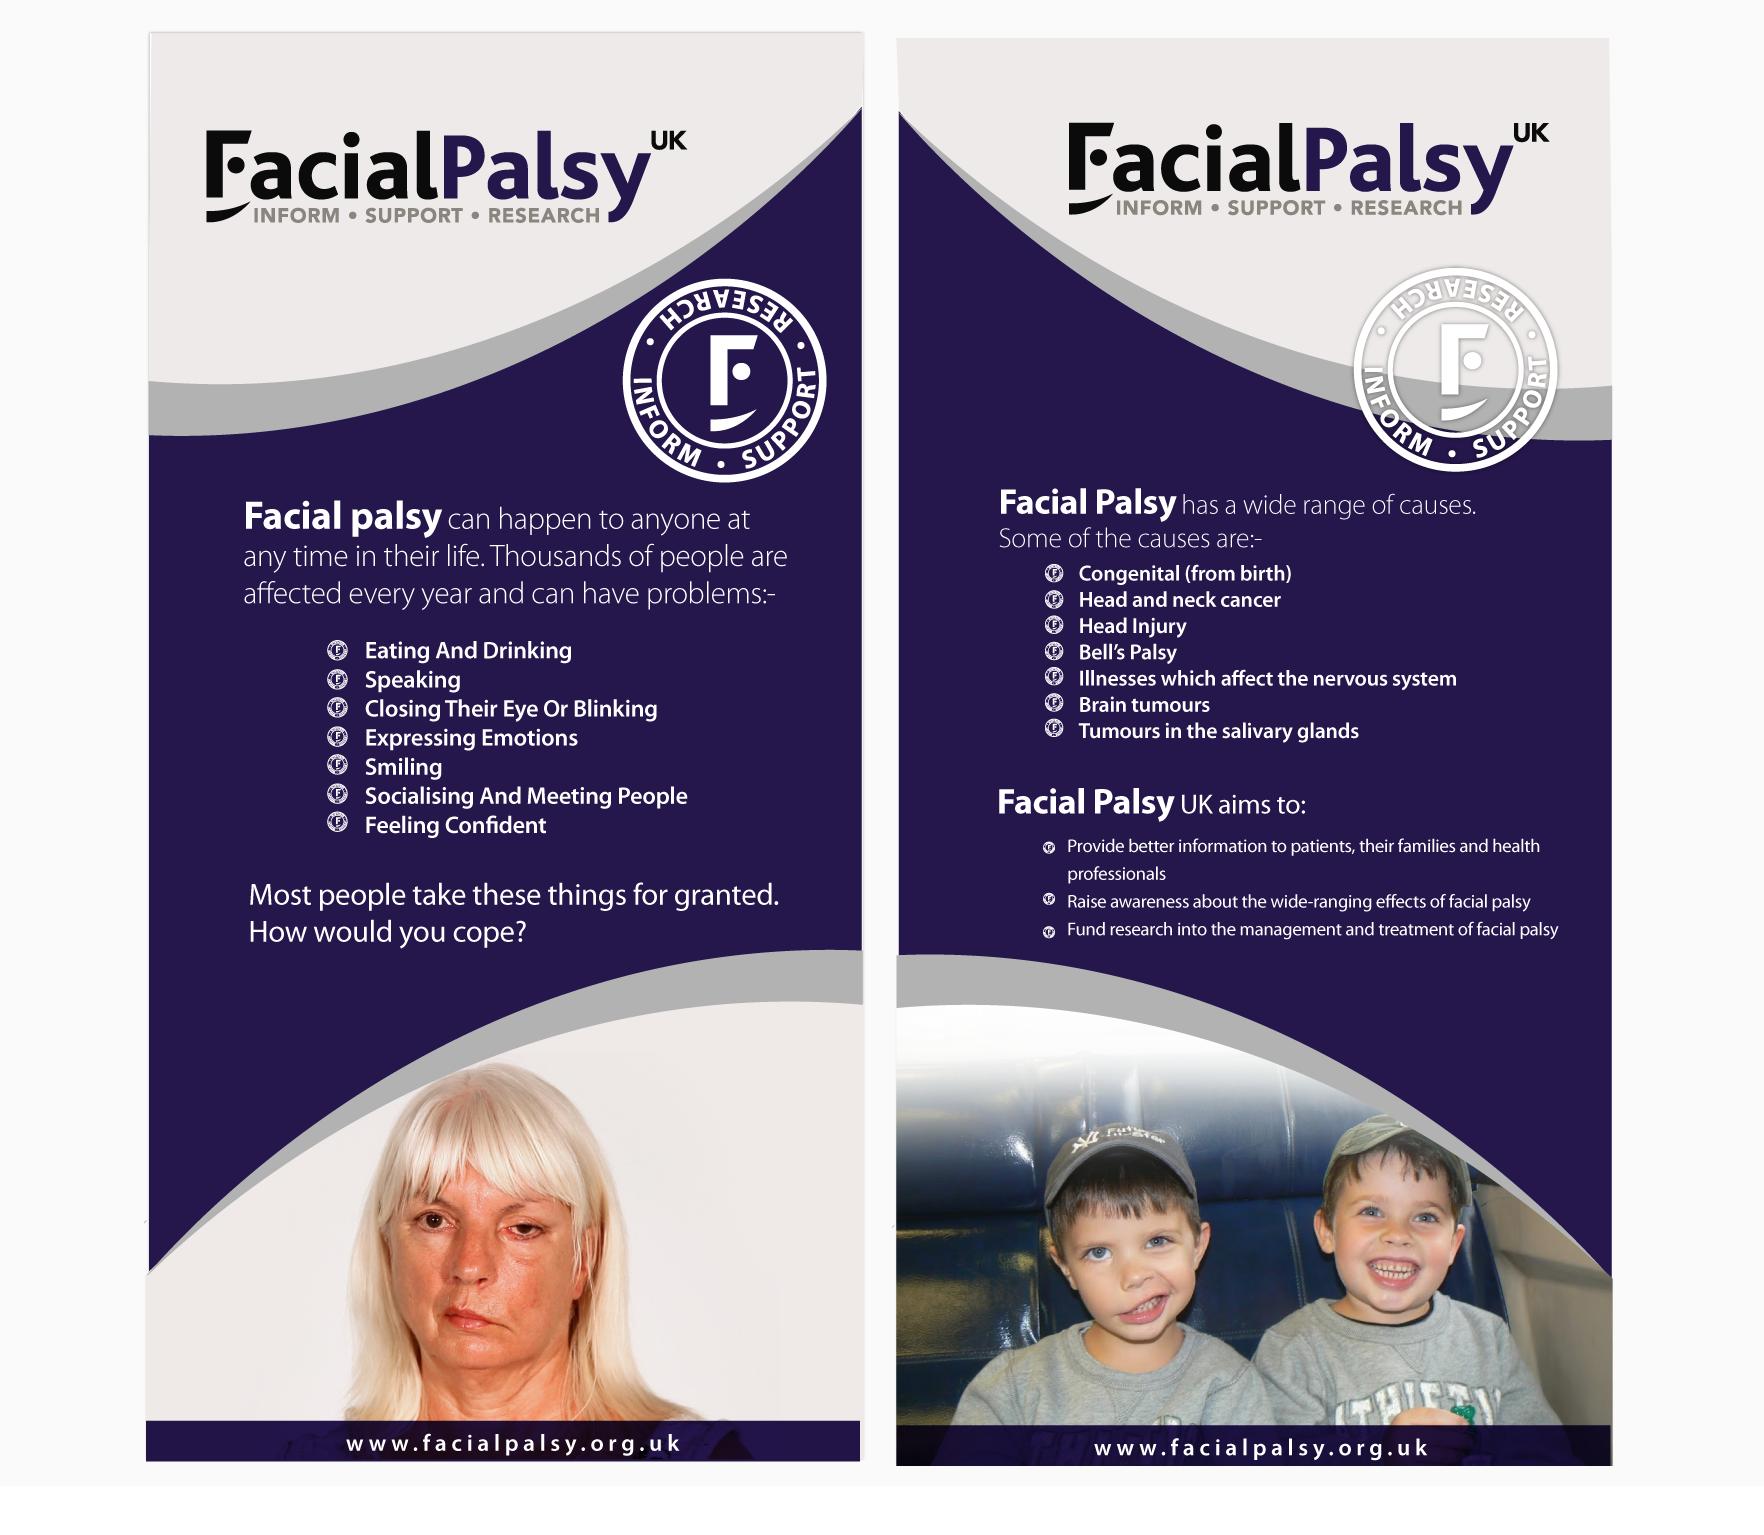 Facial Palsy UK needs a new design